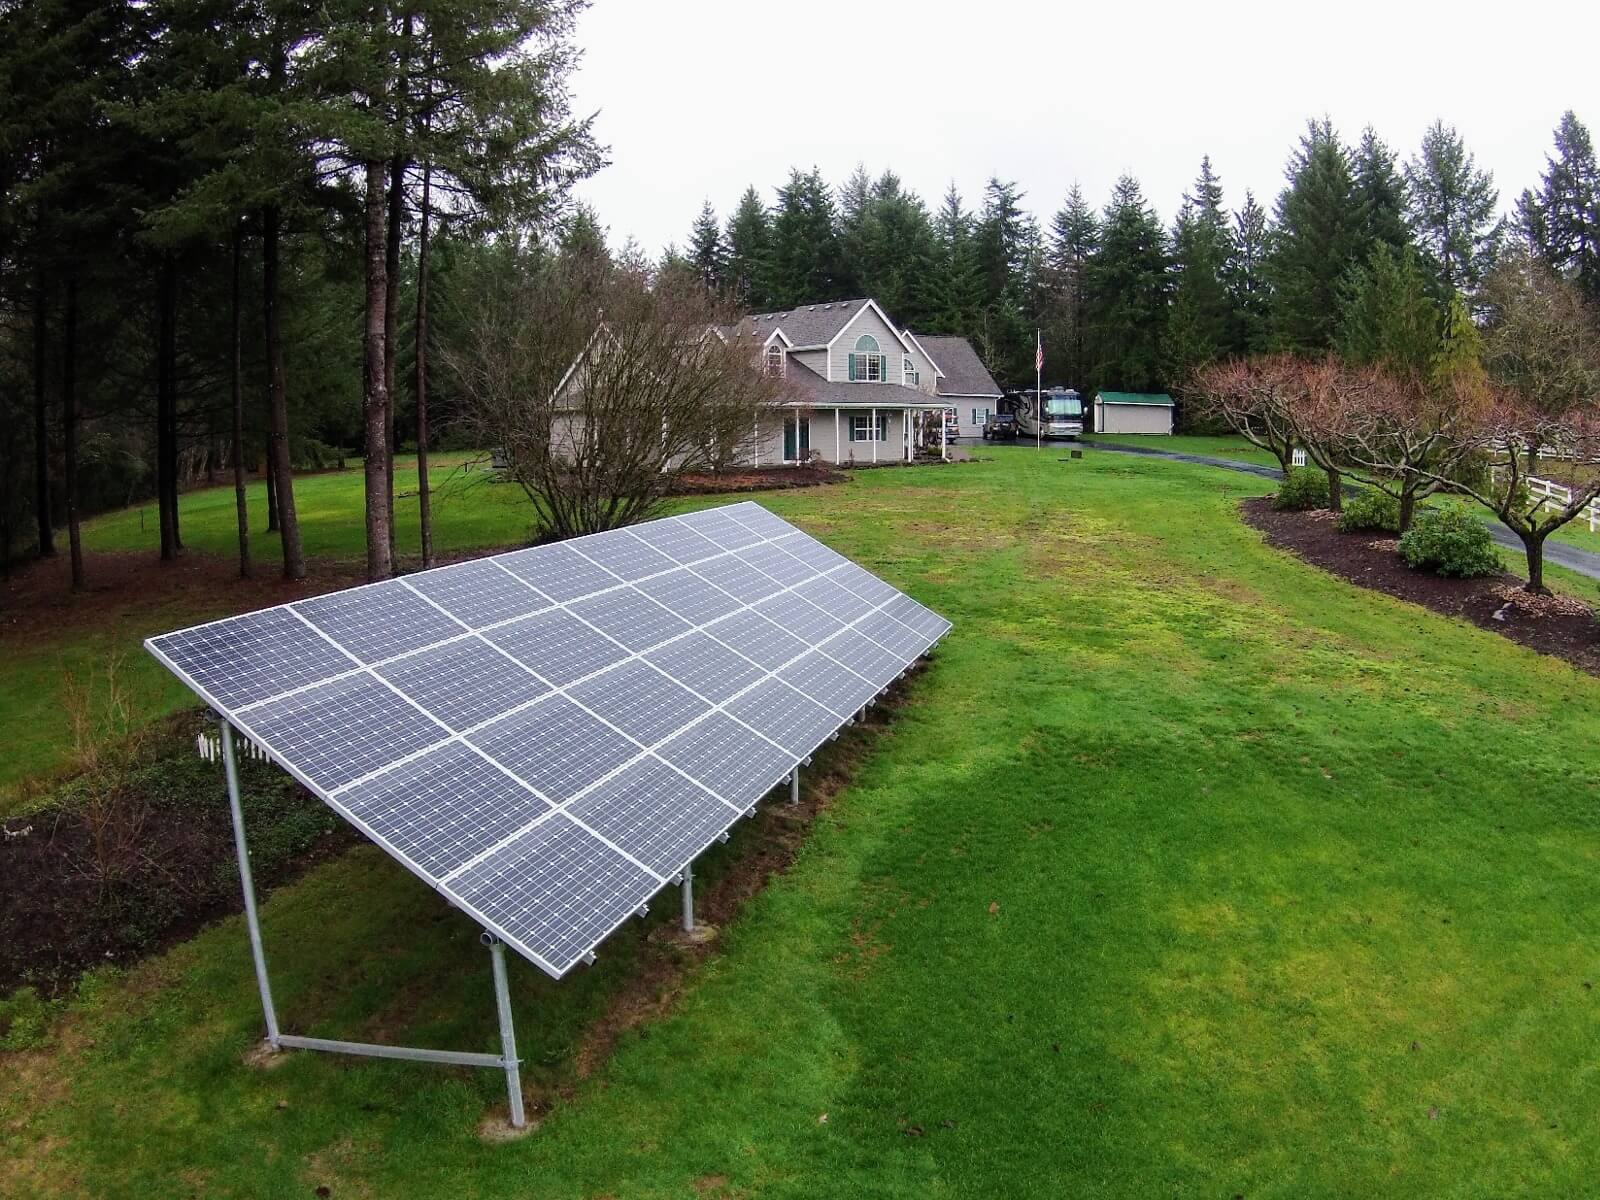 solar panel ground mount in Vancouver, Washington.jpeg